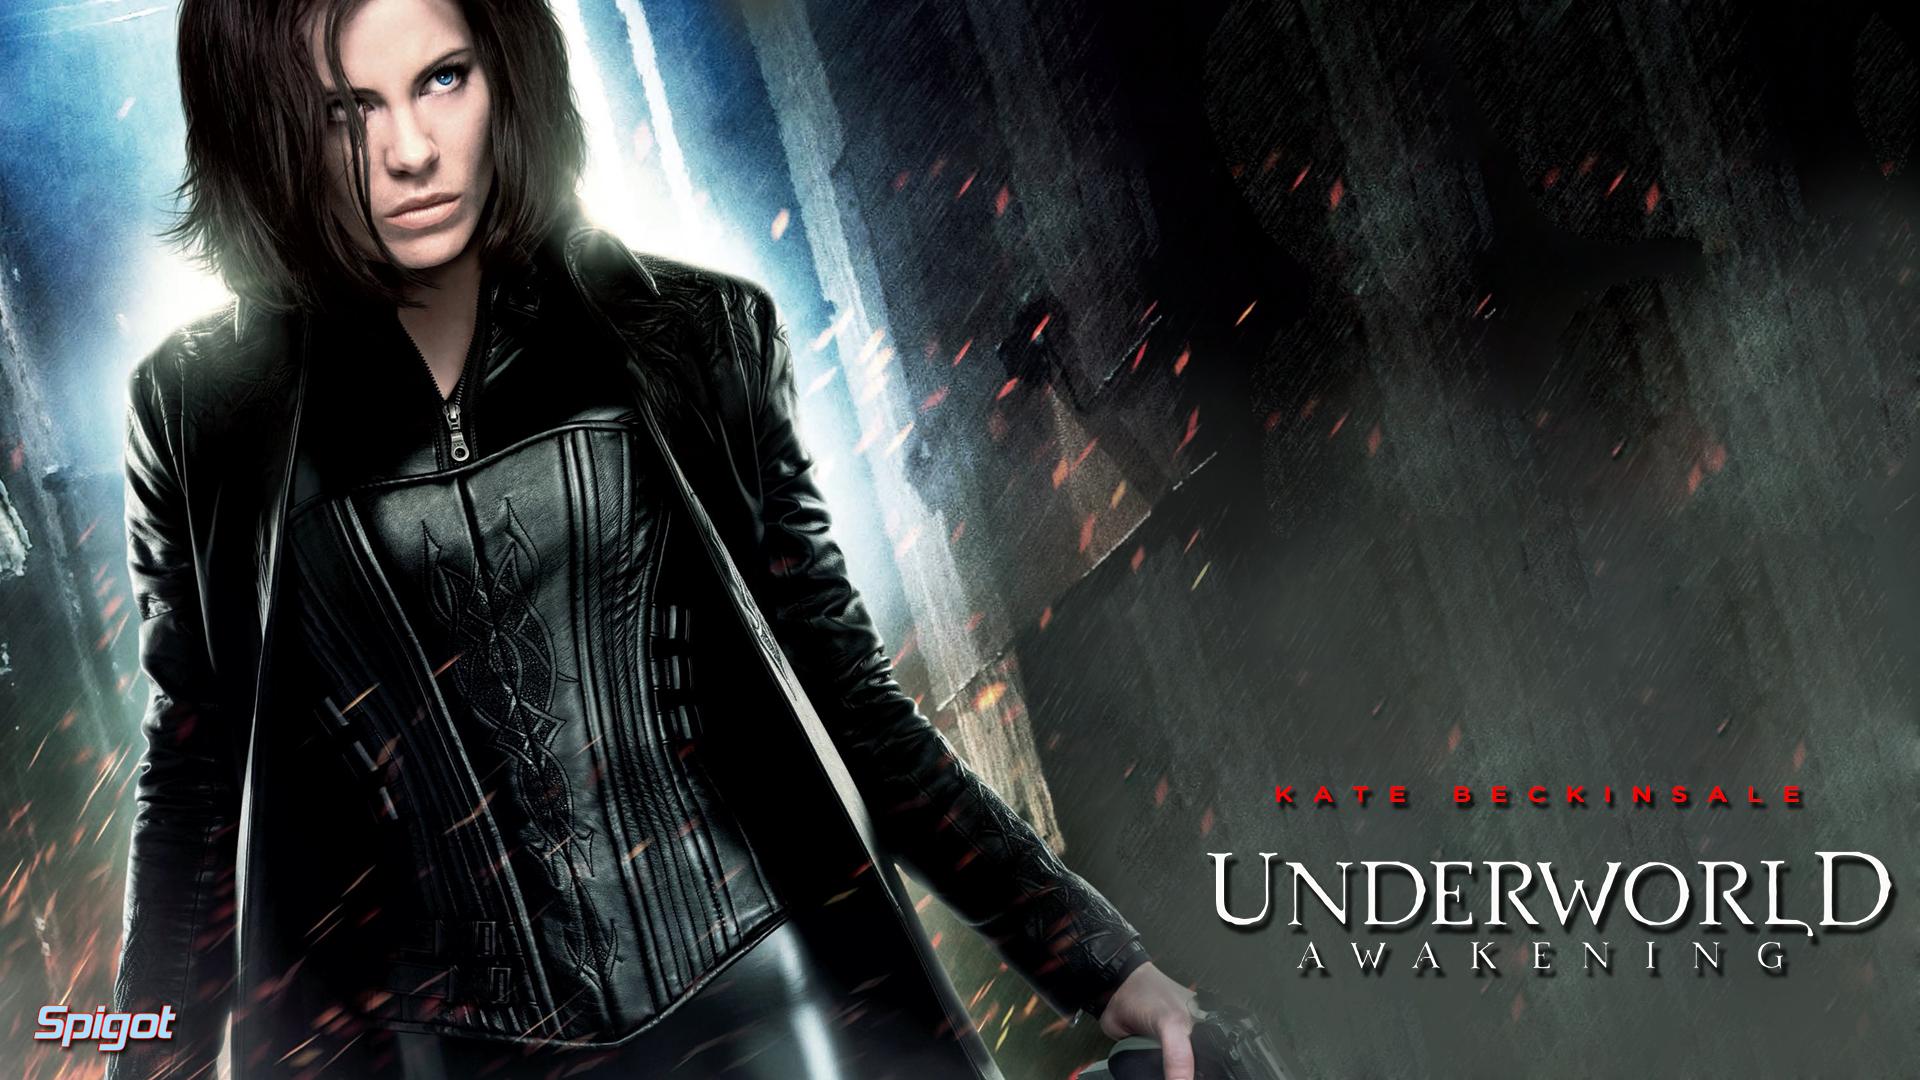 Underworld Awakening Poster wallpaper   558618 1920x1080